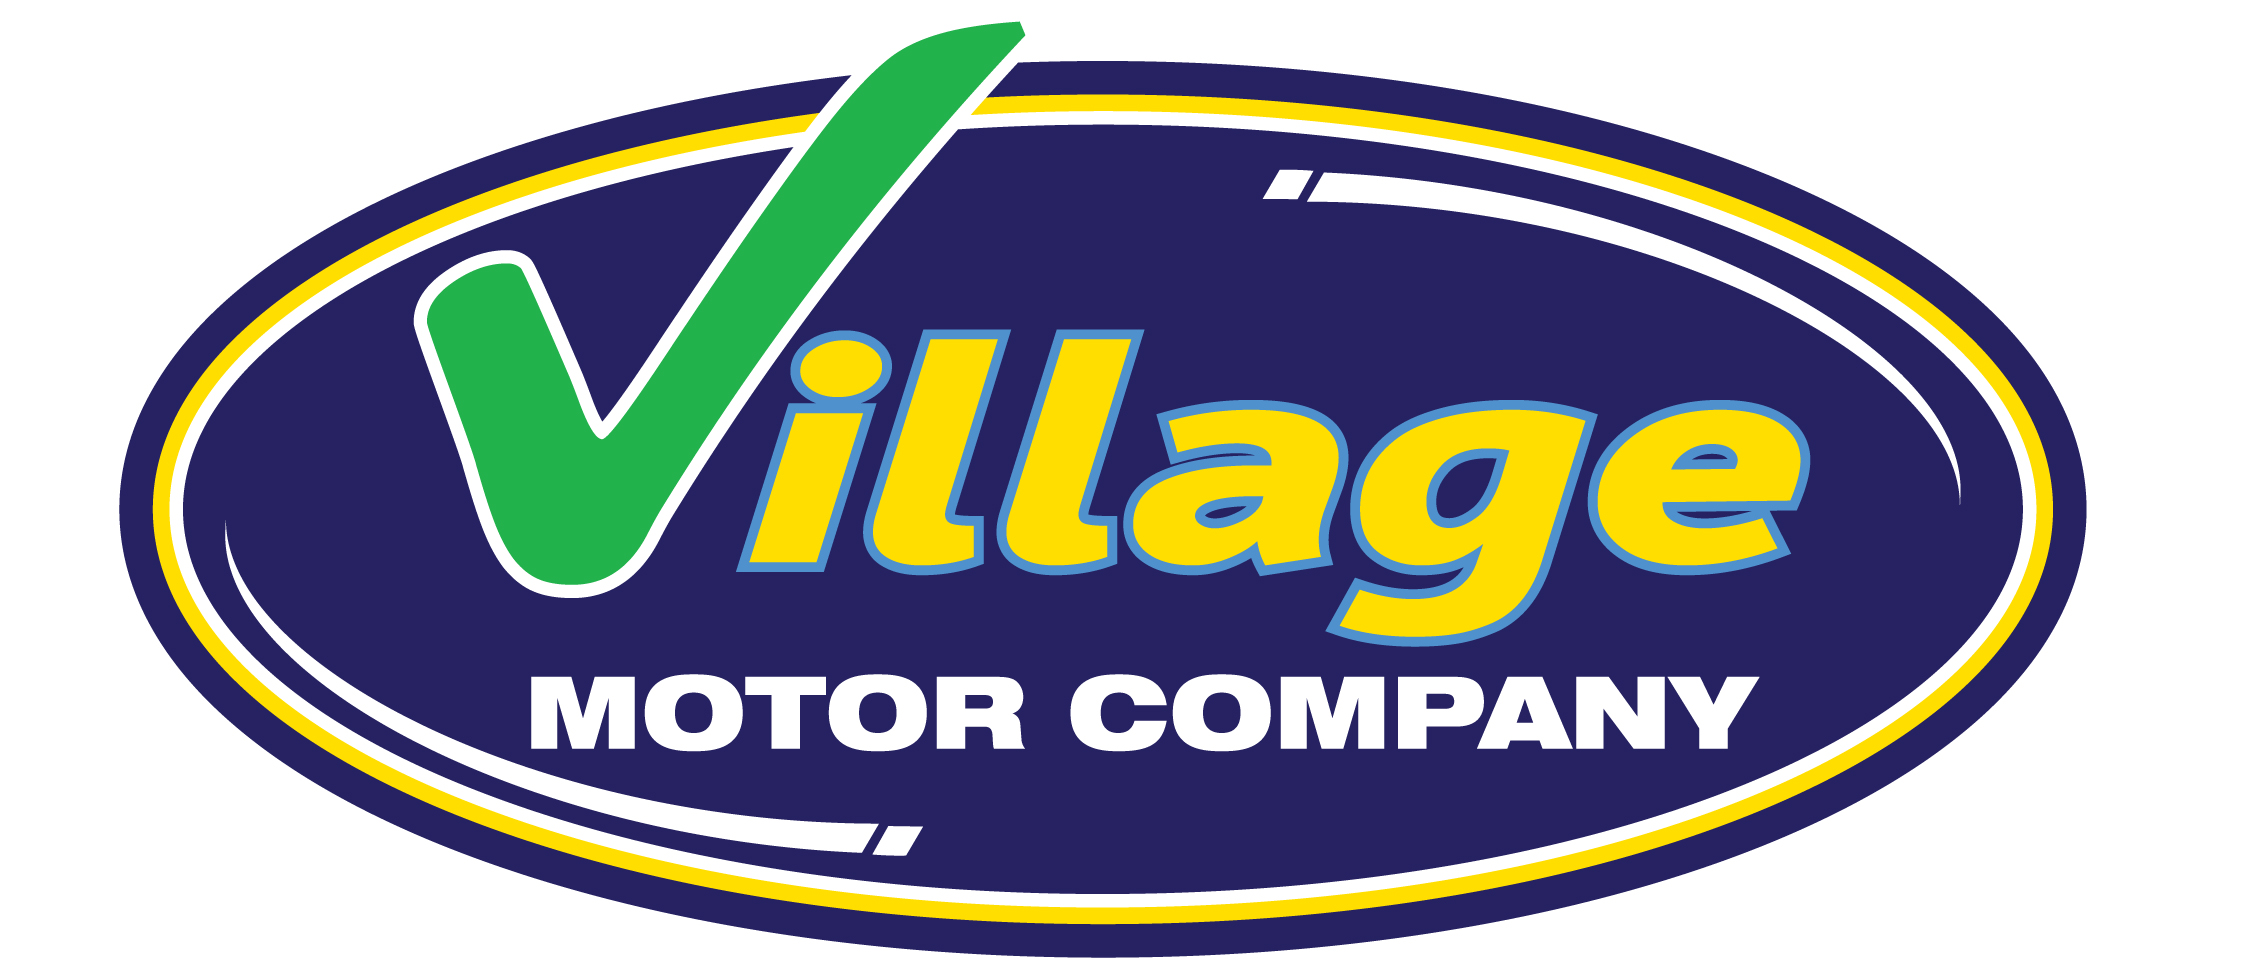 Village Motor Company